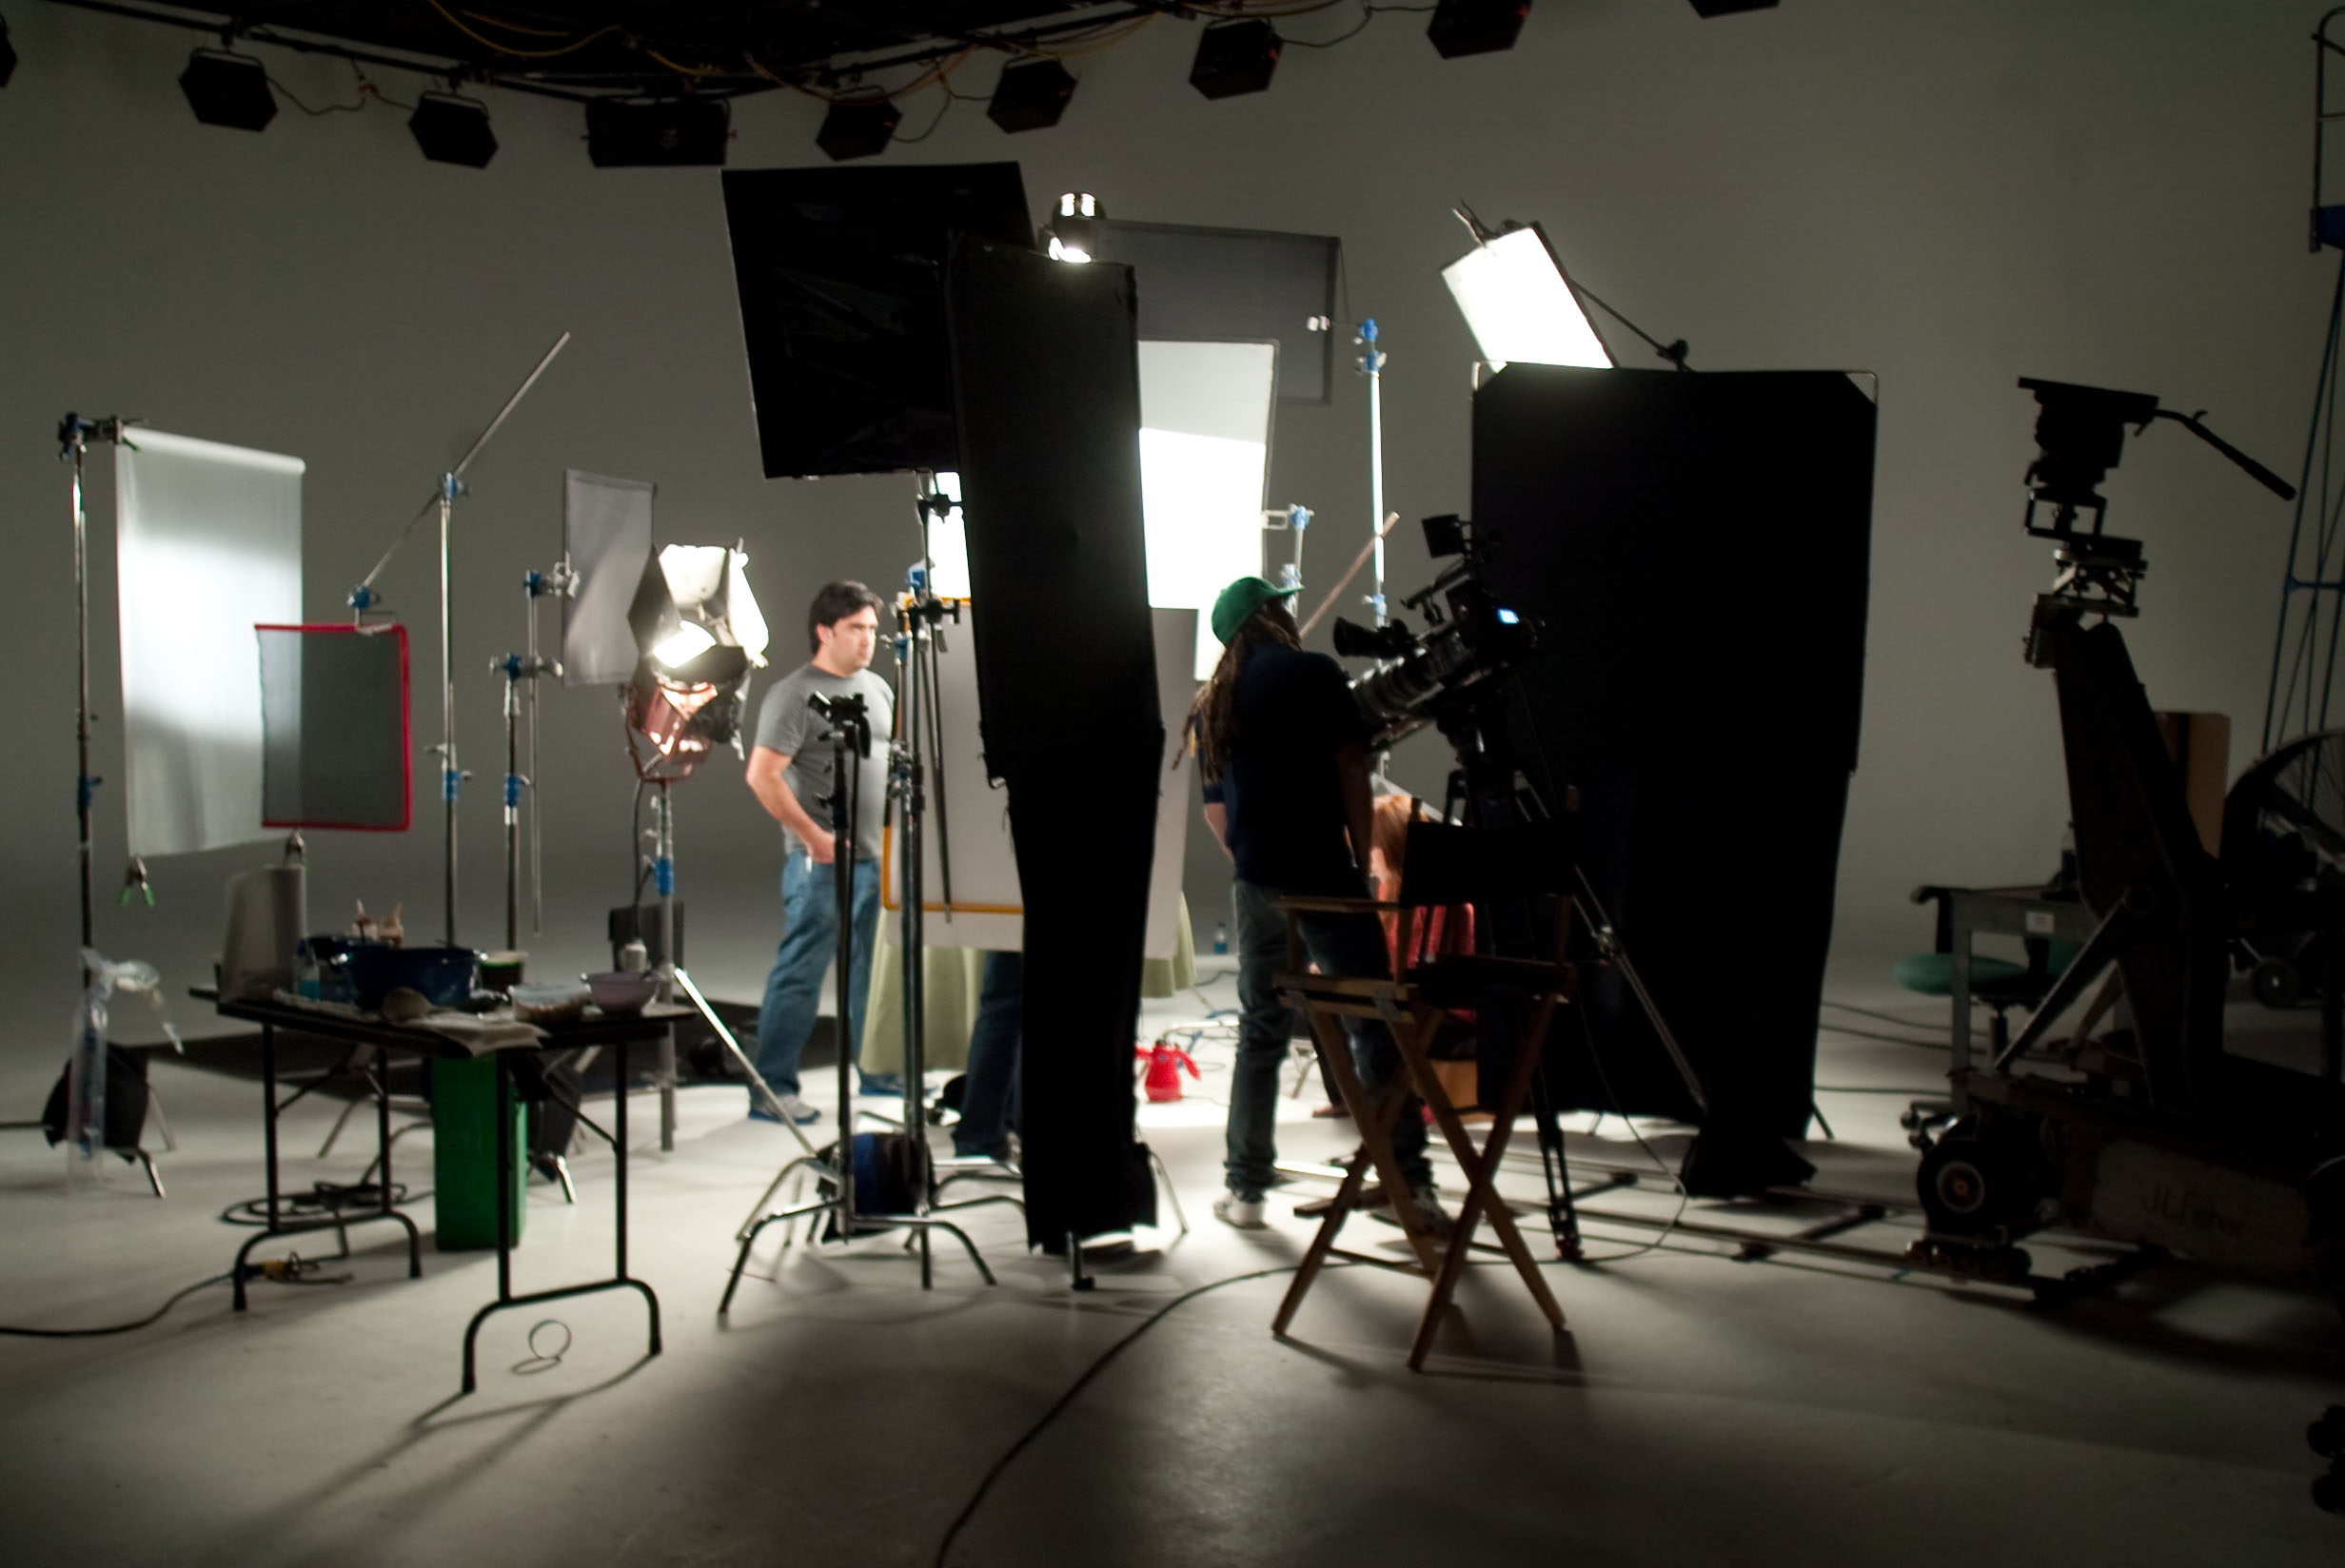 nbcs production originally filmed - HD2464×1648